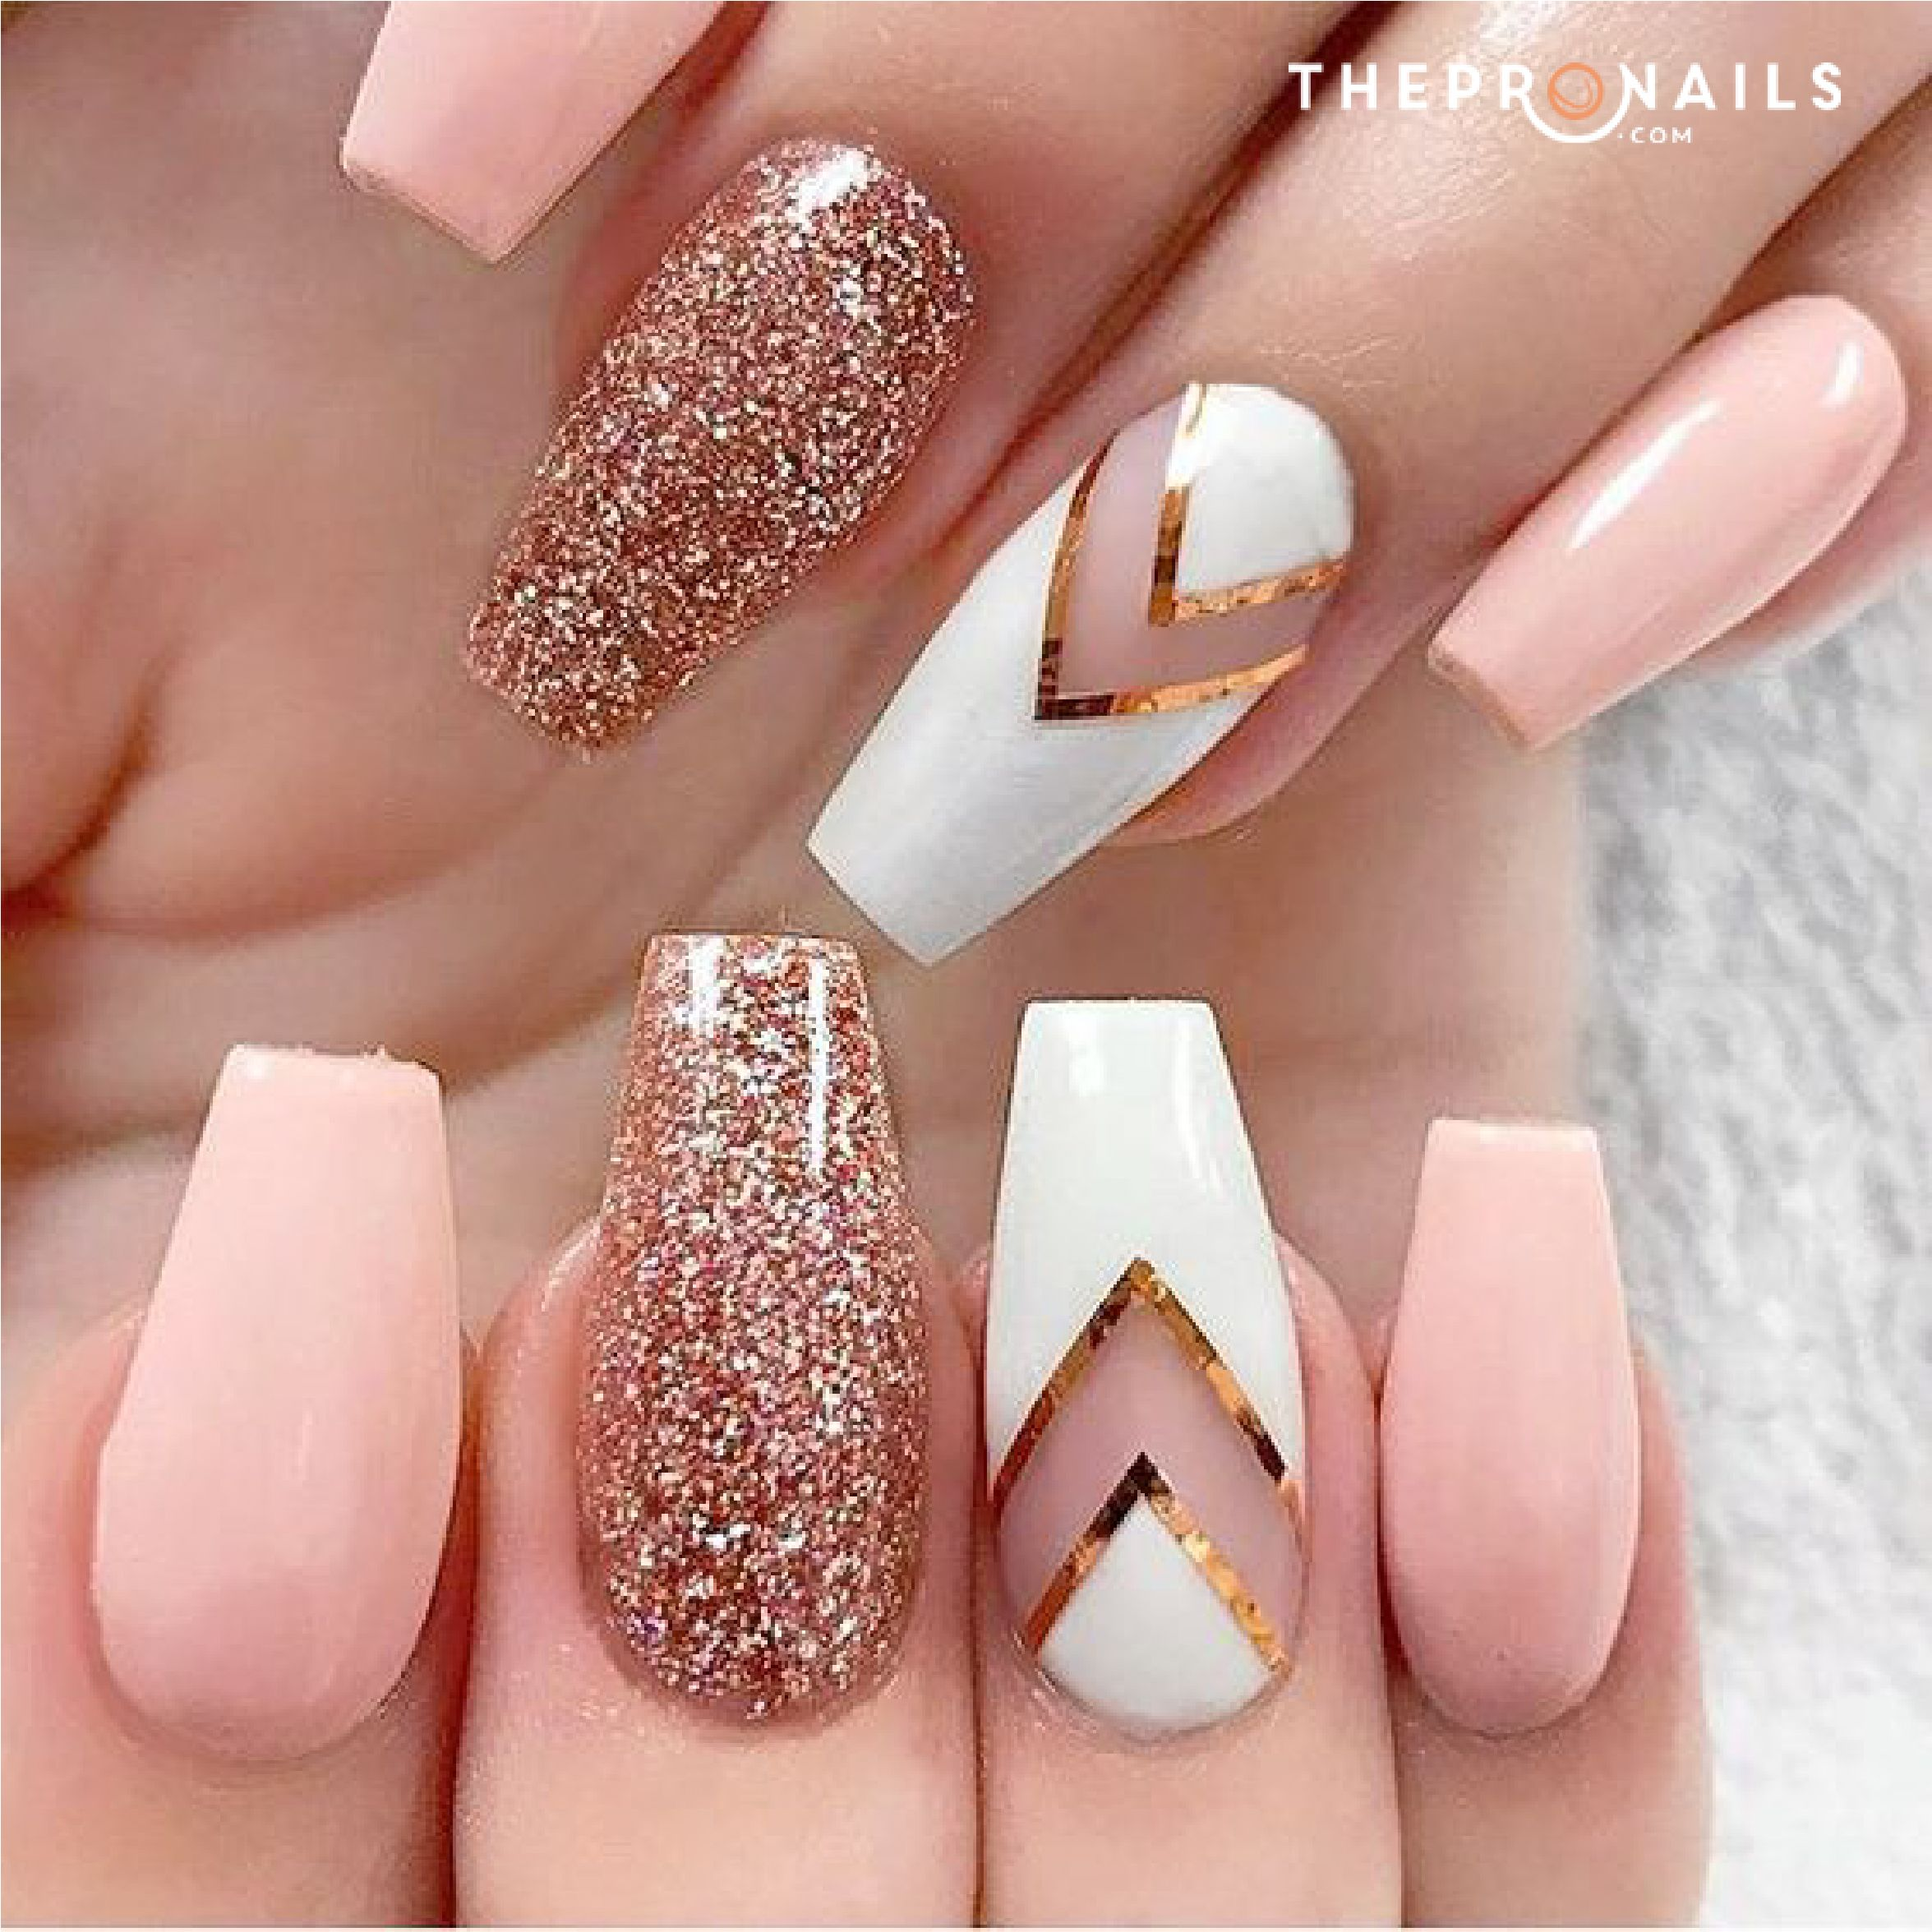 Pink Nails Nailart Beauty Thepronails Nail Art Pinterest